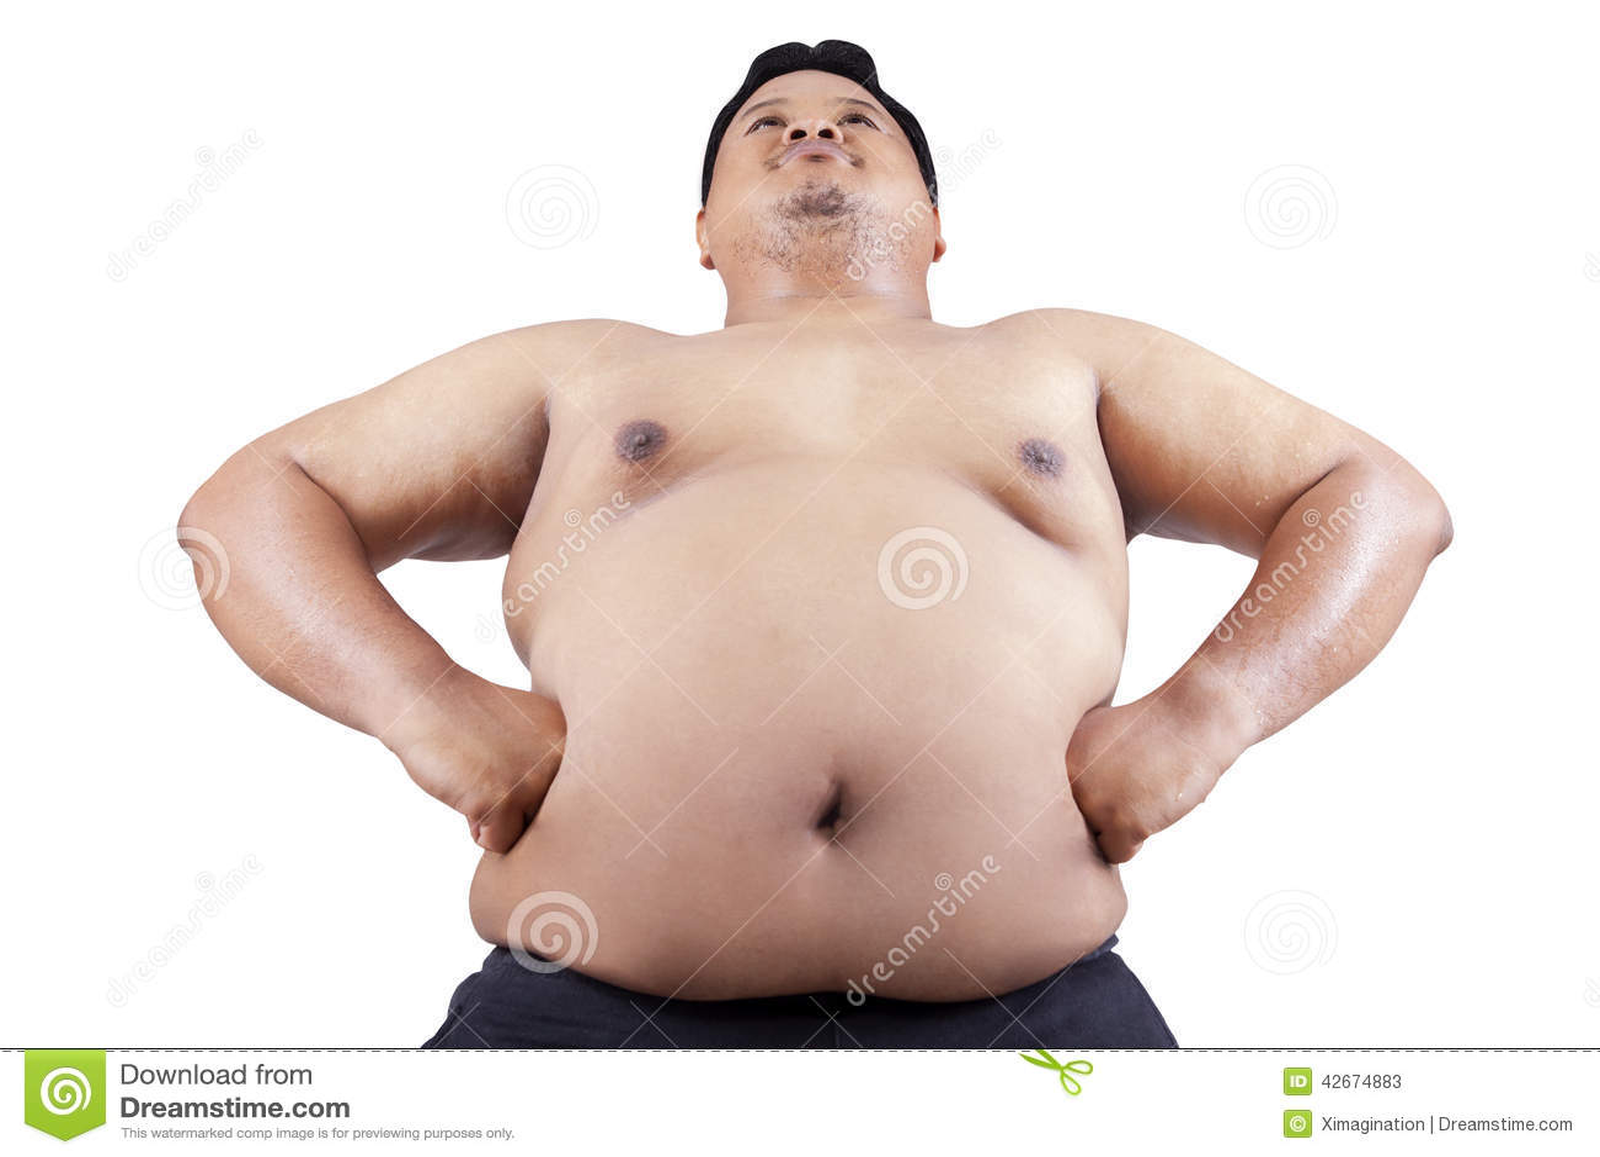 christine fucking huge dildo